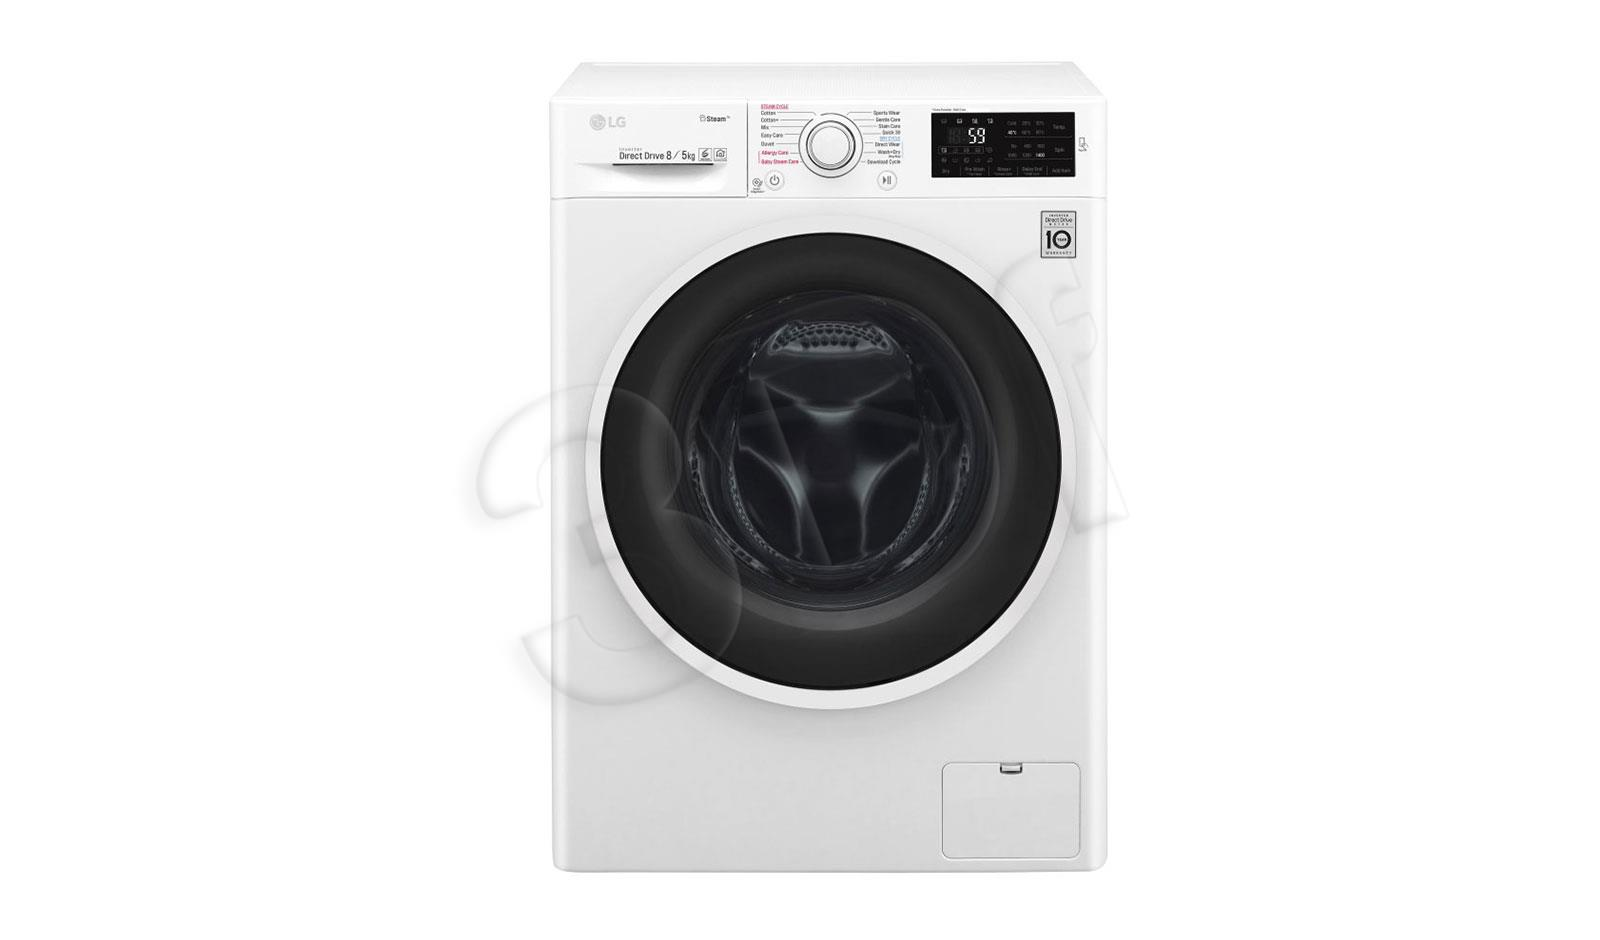 Washer-dryer LG F4J6TG0W (1400 rpm; 8 kg; 560 mm) AGDLG-SUW0003 Veļas žāvētājs